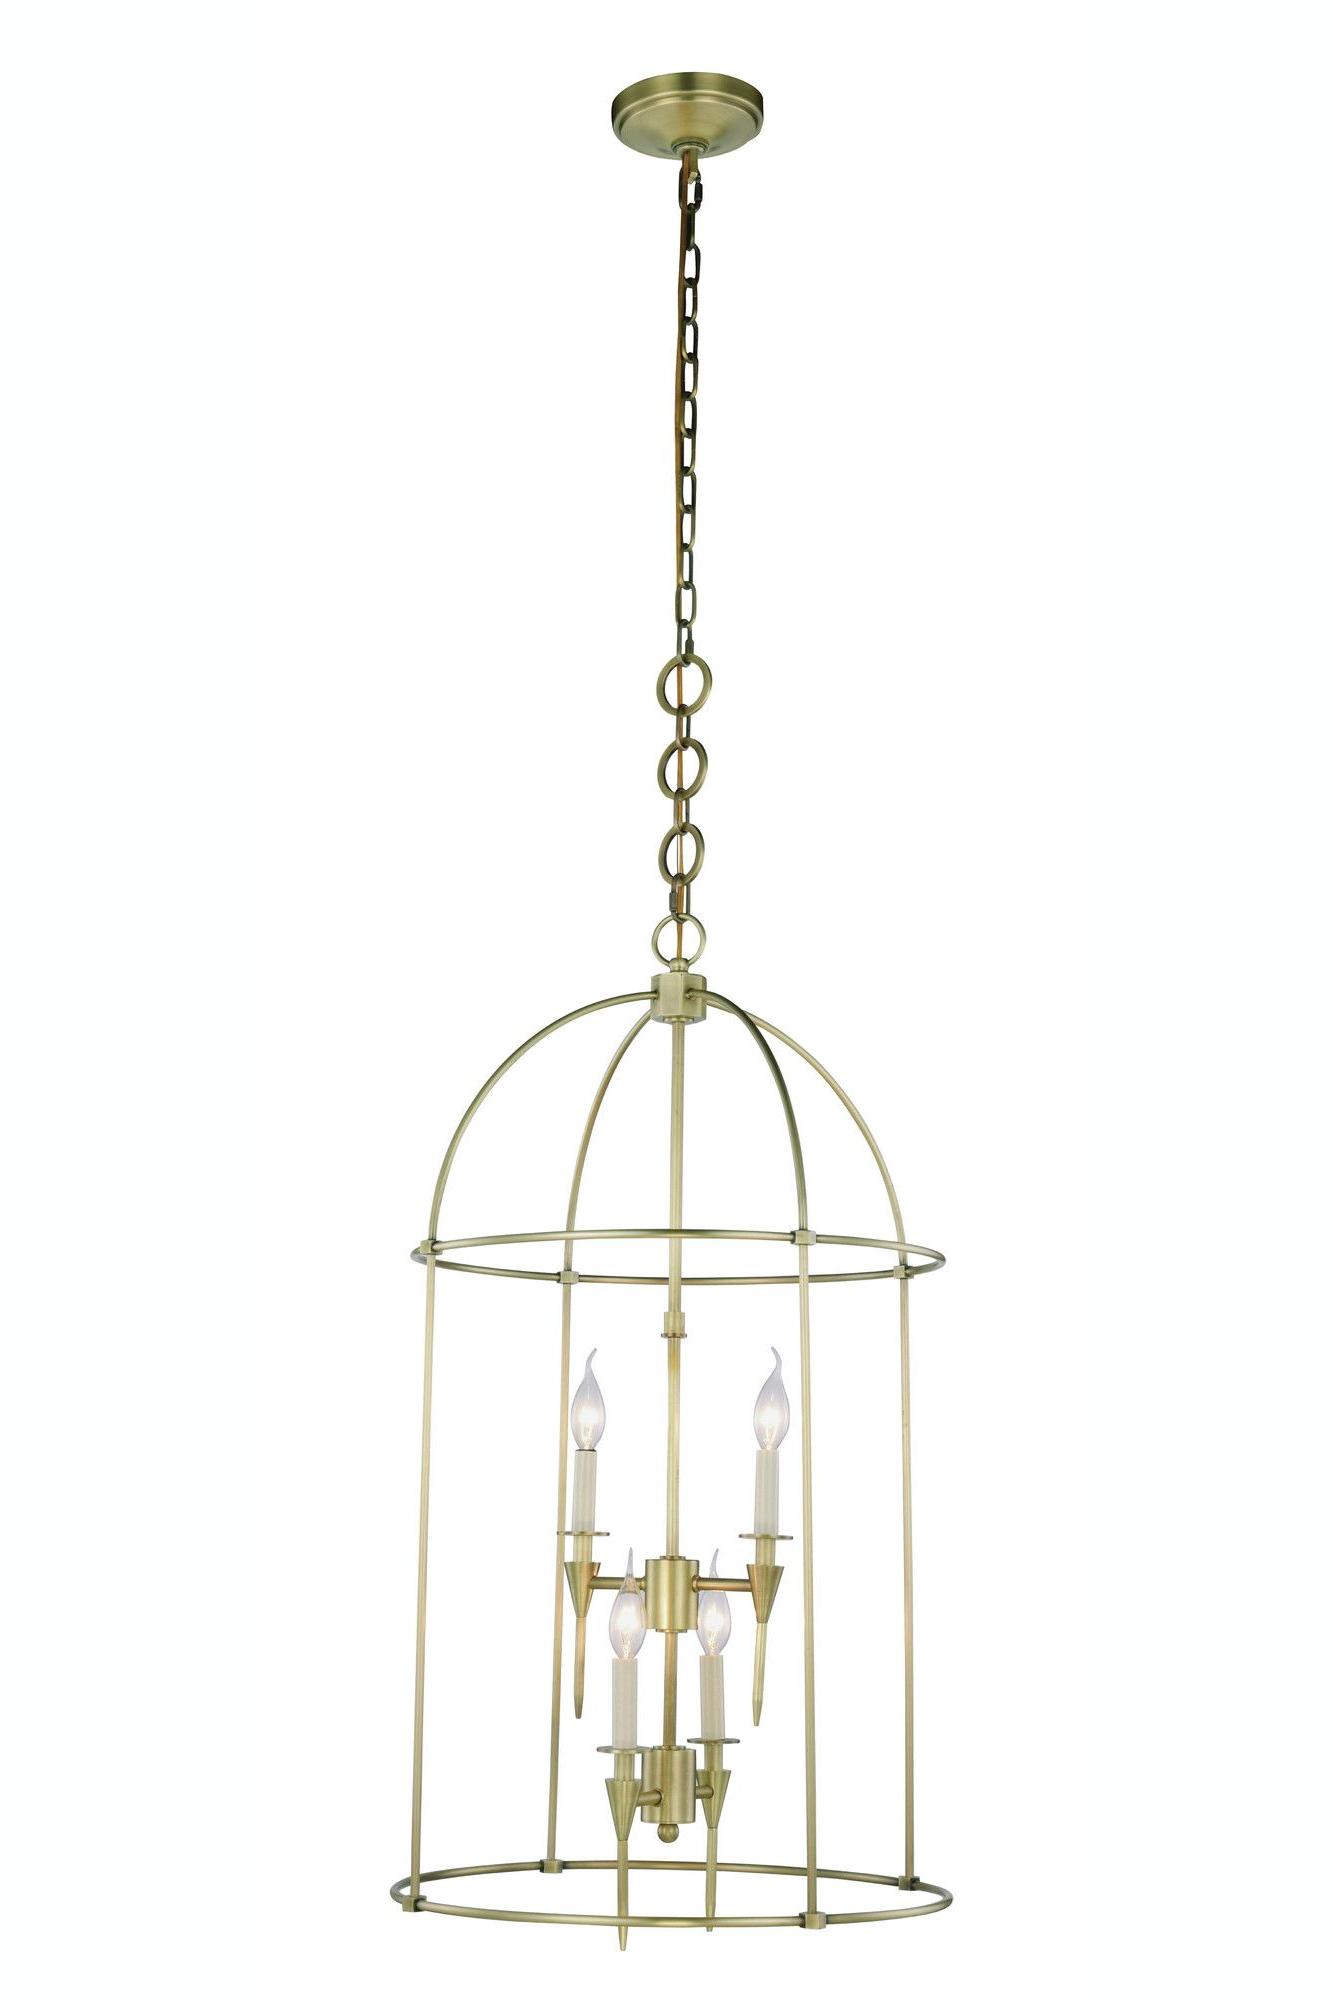 Lighting, Pendant Within Armande 4 Light Lantern Drum Pendants (View 17 of 20)